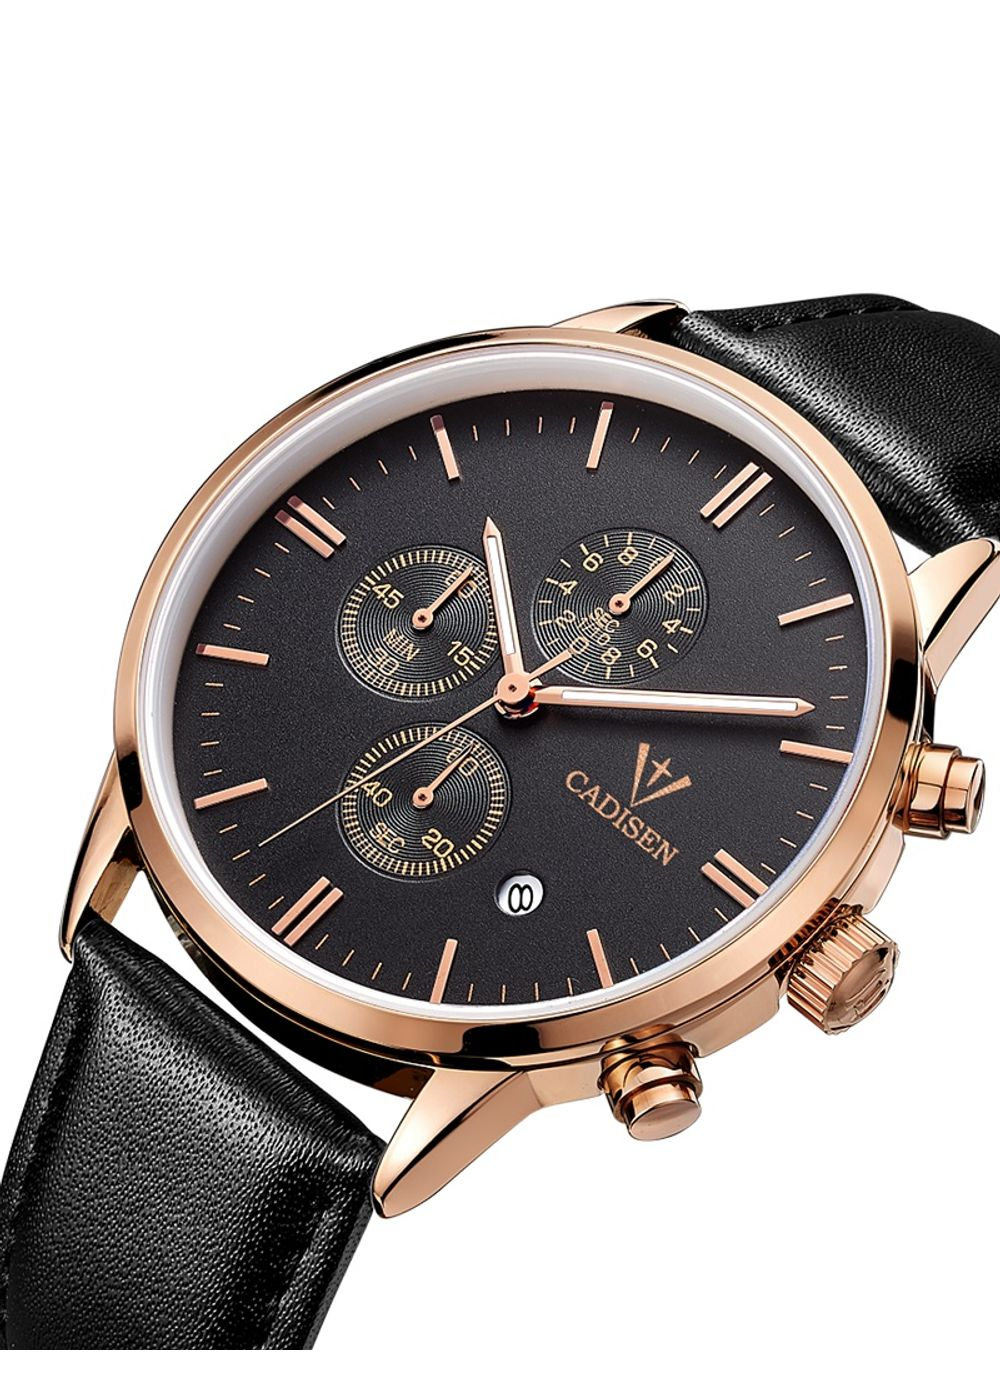 a9060253ffae Cadisen-ca9021-analog-chronograph Watch For-menblack-gold